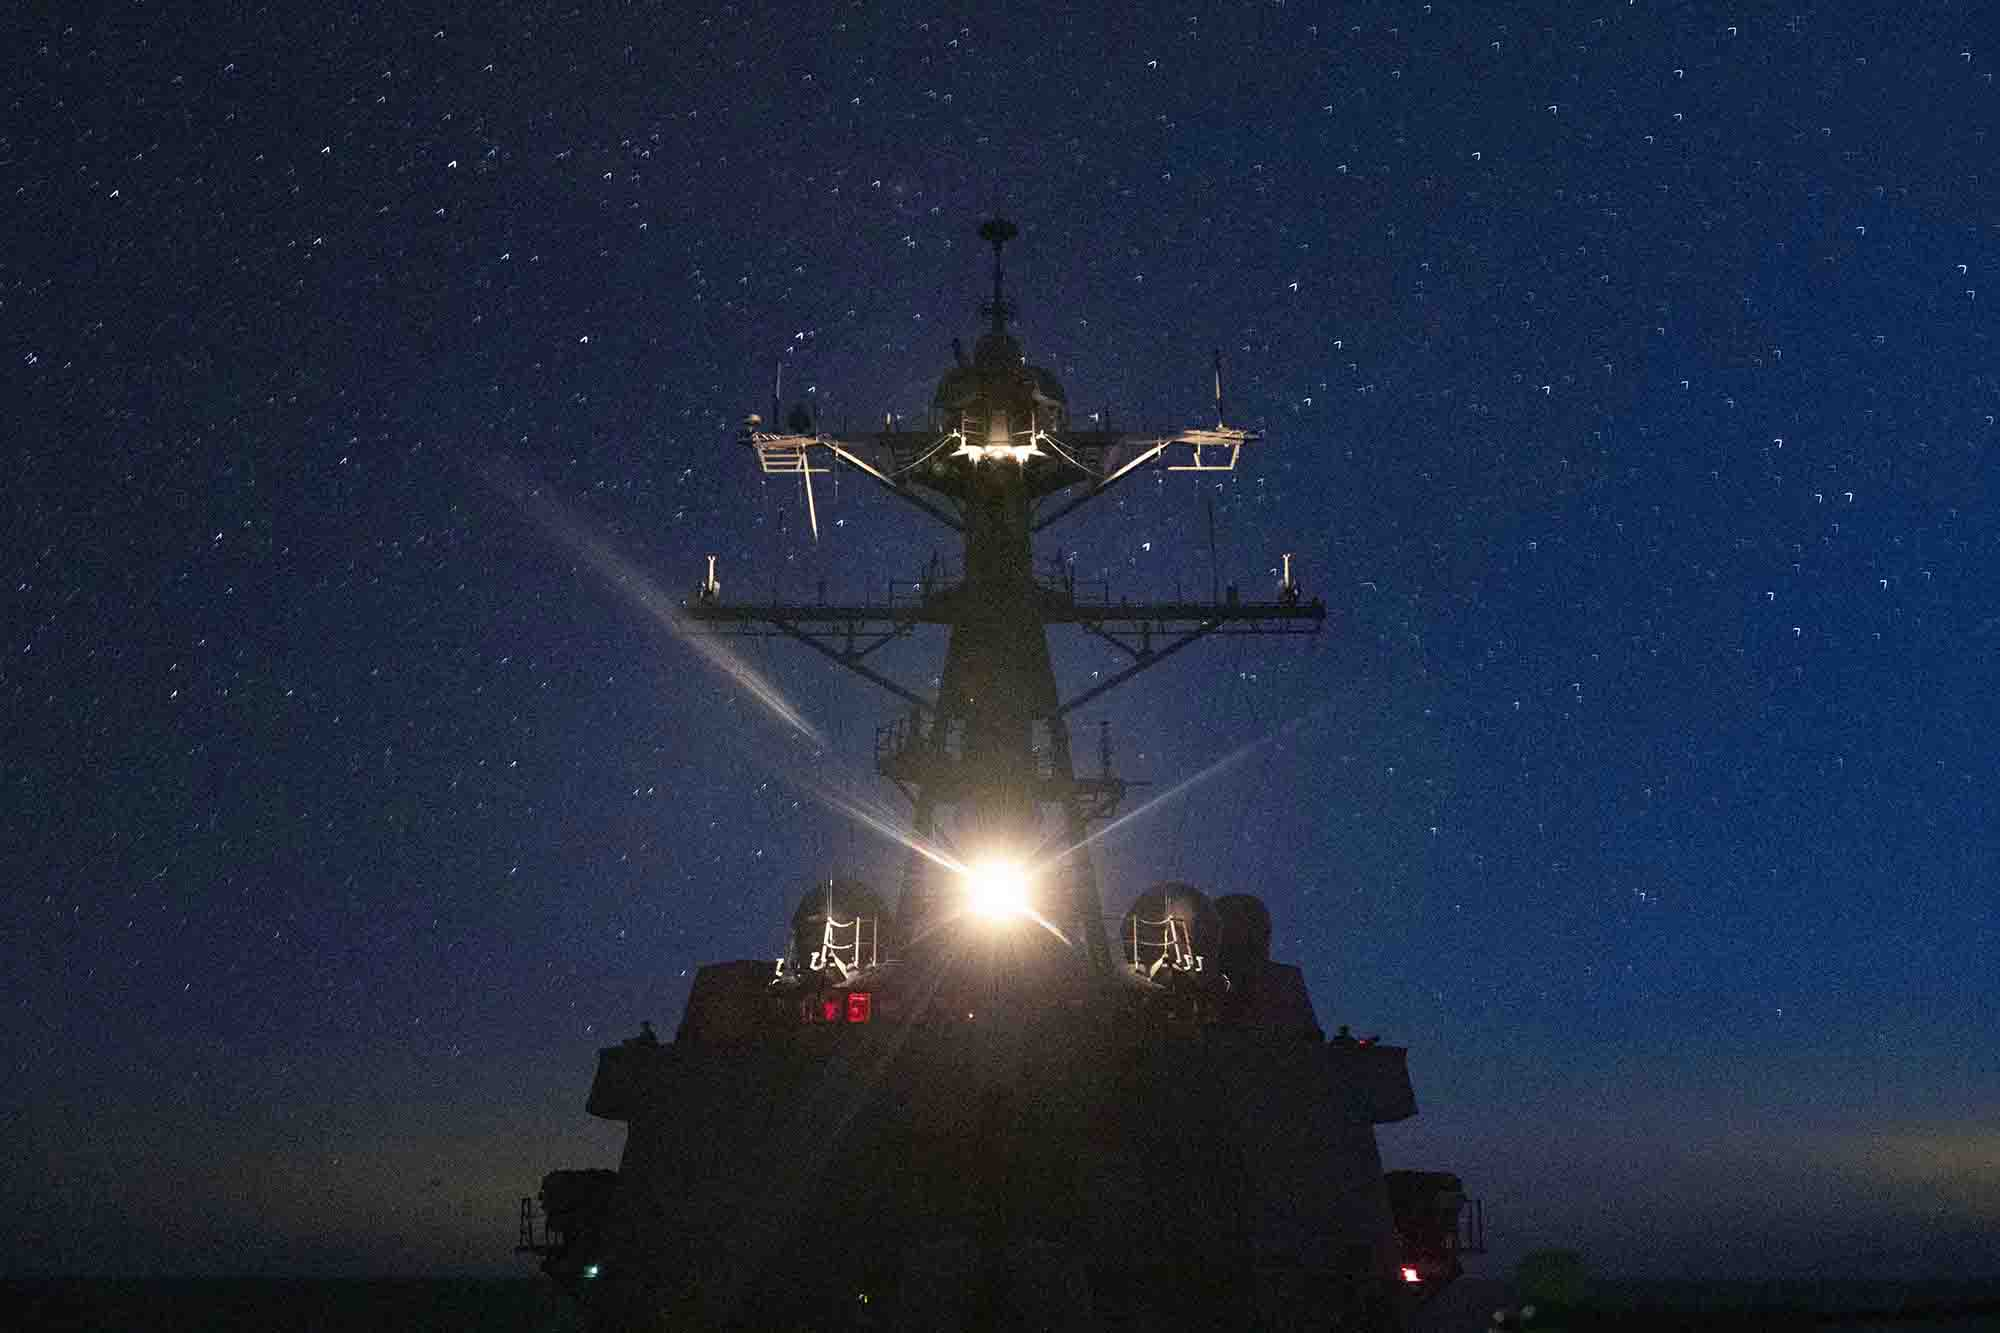 The Arleigh Burke-class guided missile destroyer USS Lassen (DDG 82) steams in the Atlantic Ocean, June 9, 2021. (MC3 Zachary Melvin/Navy)